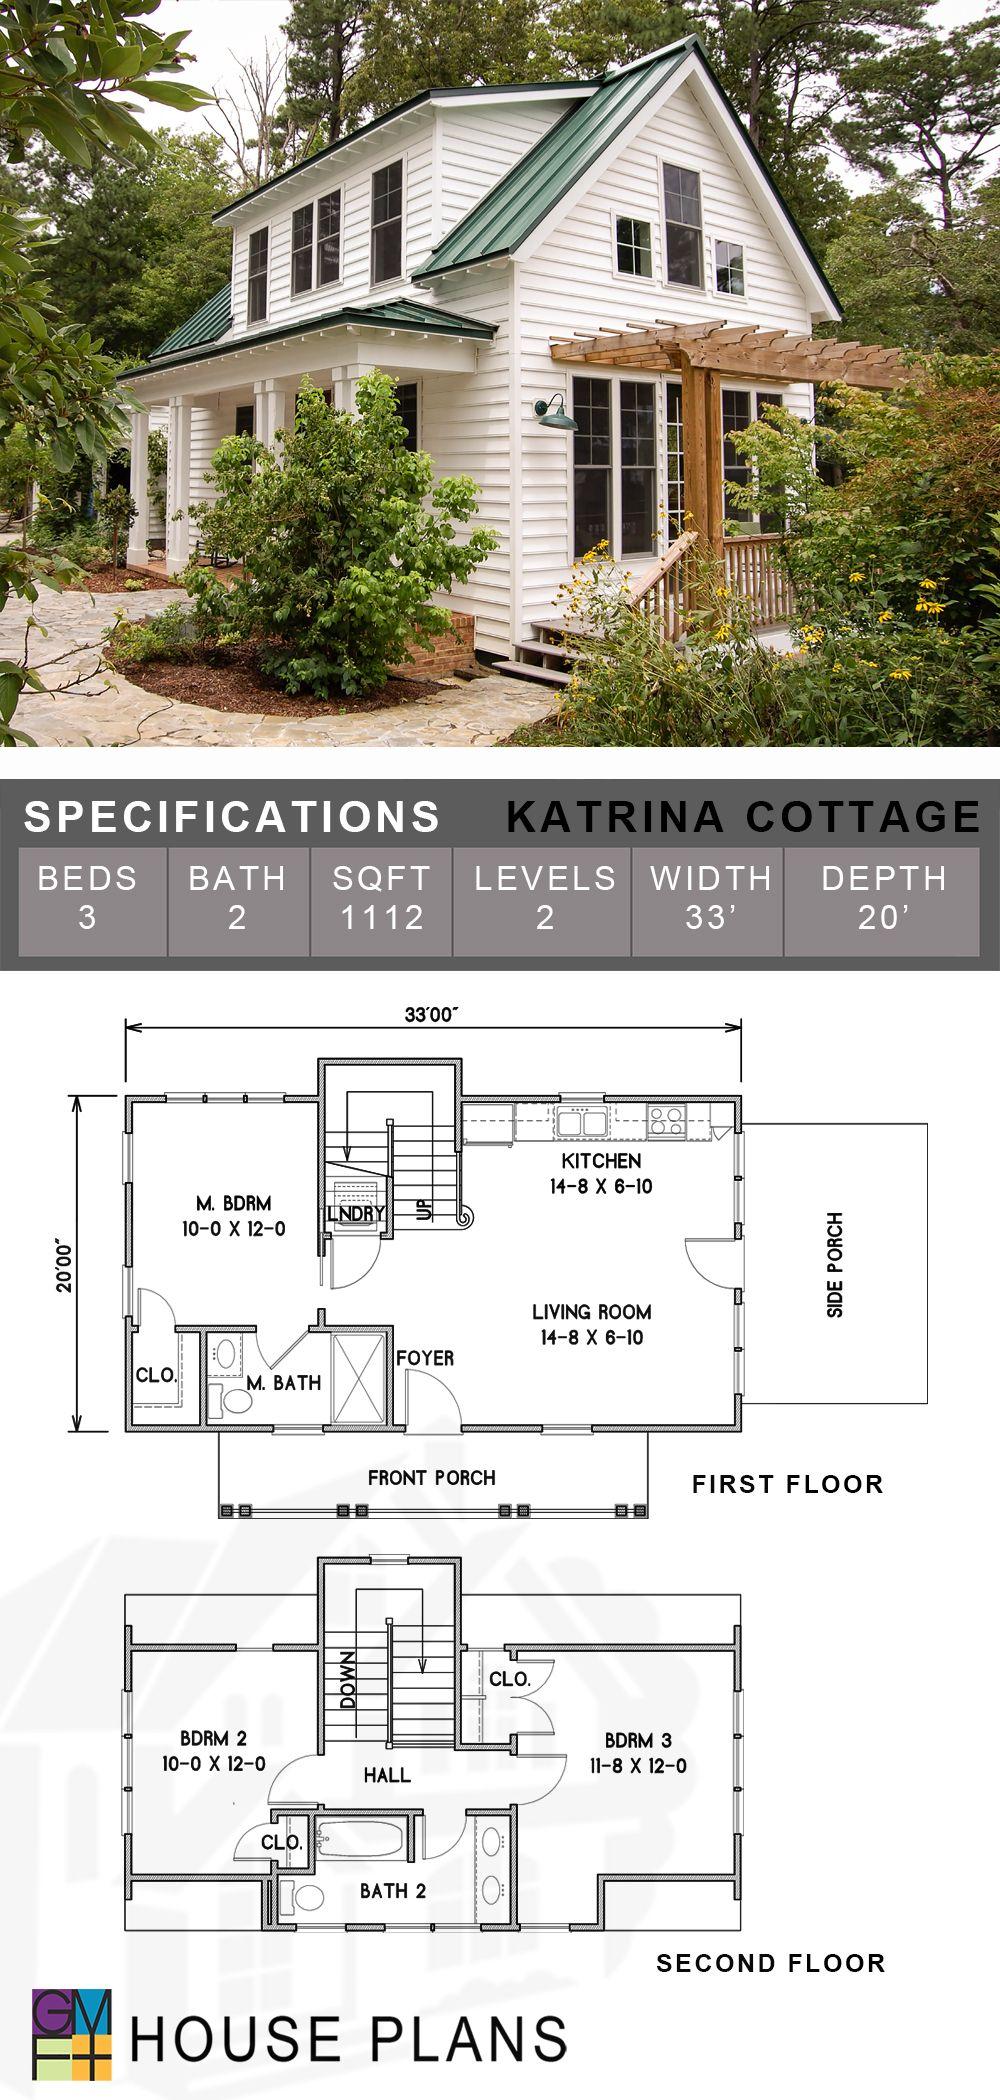 Katrina Cottage Sims House Plans Dream House Plans Cottage House Plans